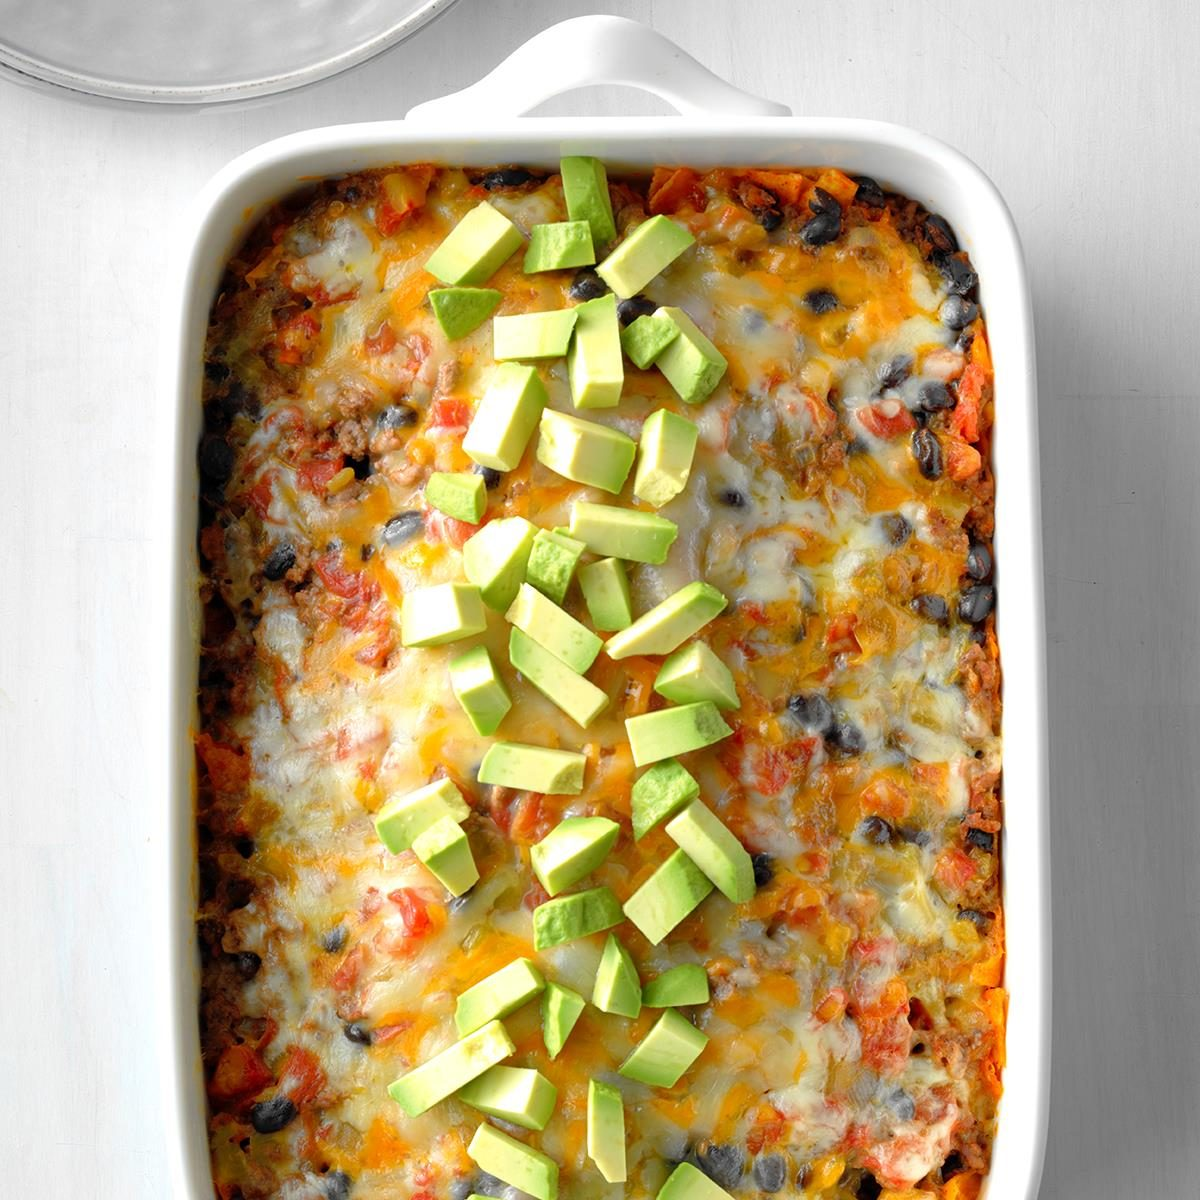 80 Taste of Home Recipes People Are Loving on Pinterest